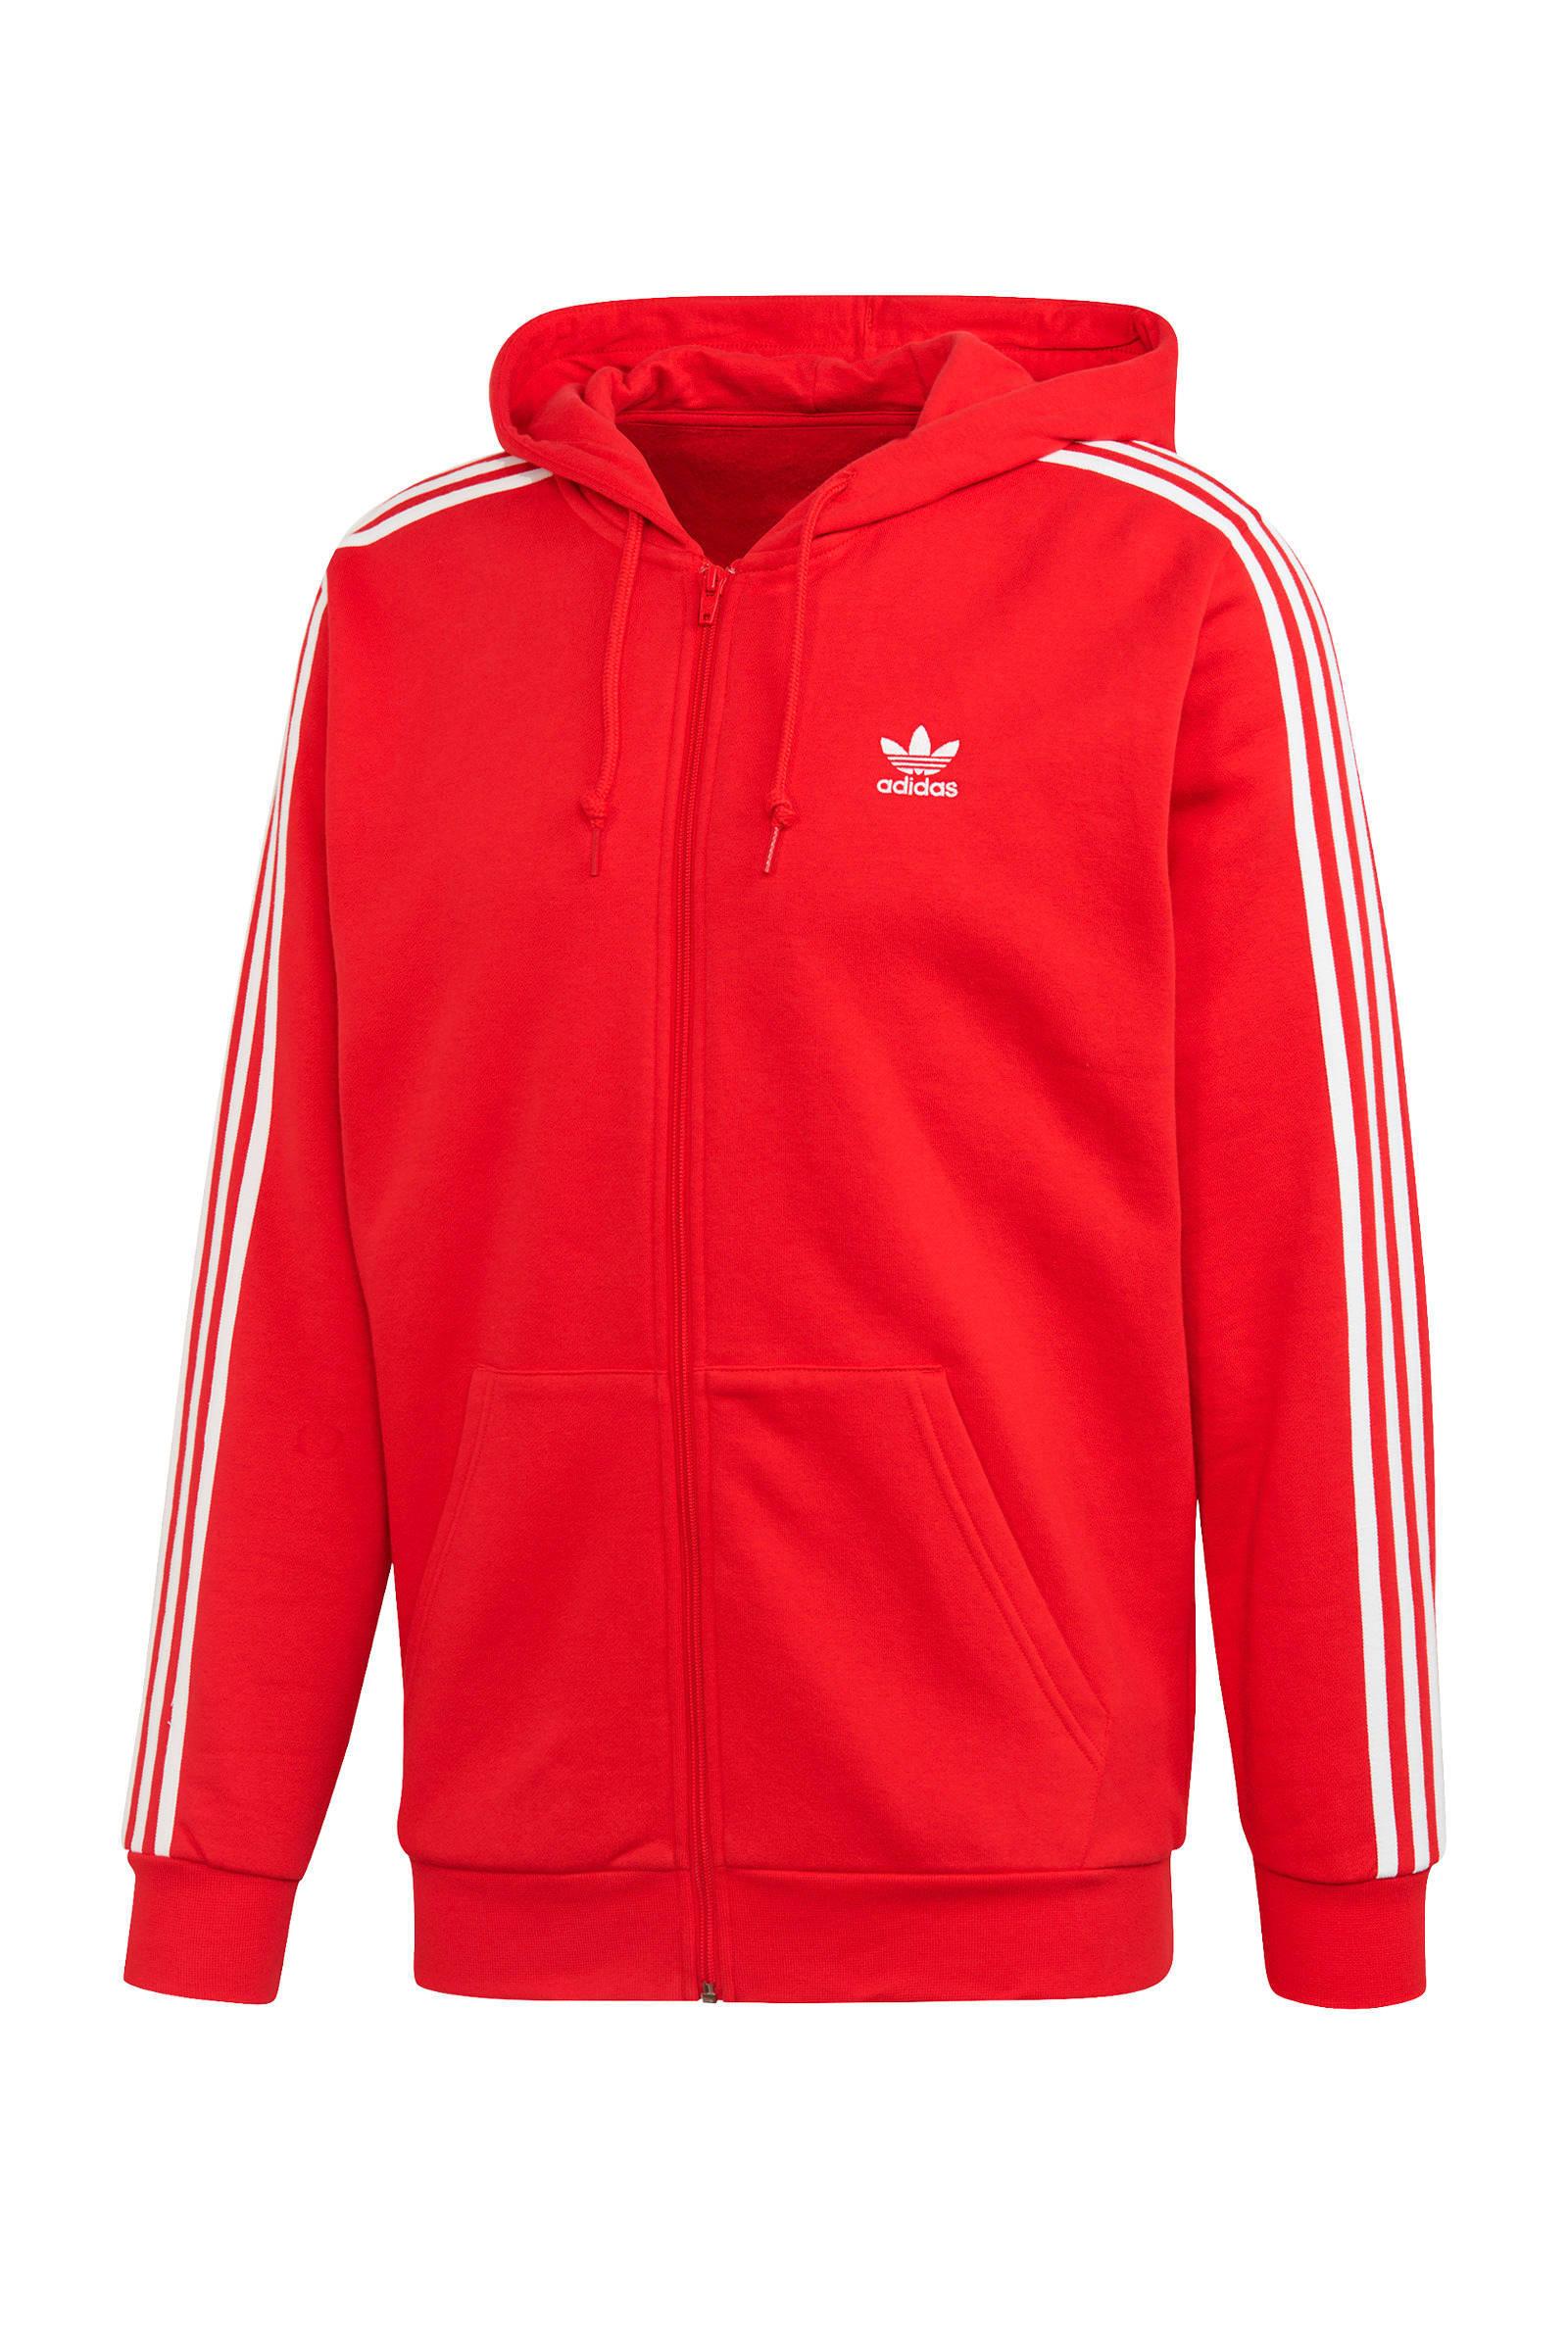 adidas Originals Adicolor vest rood | wehkamp